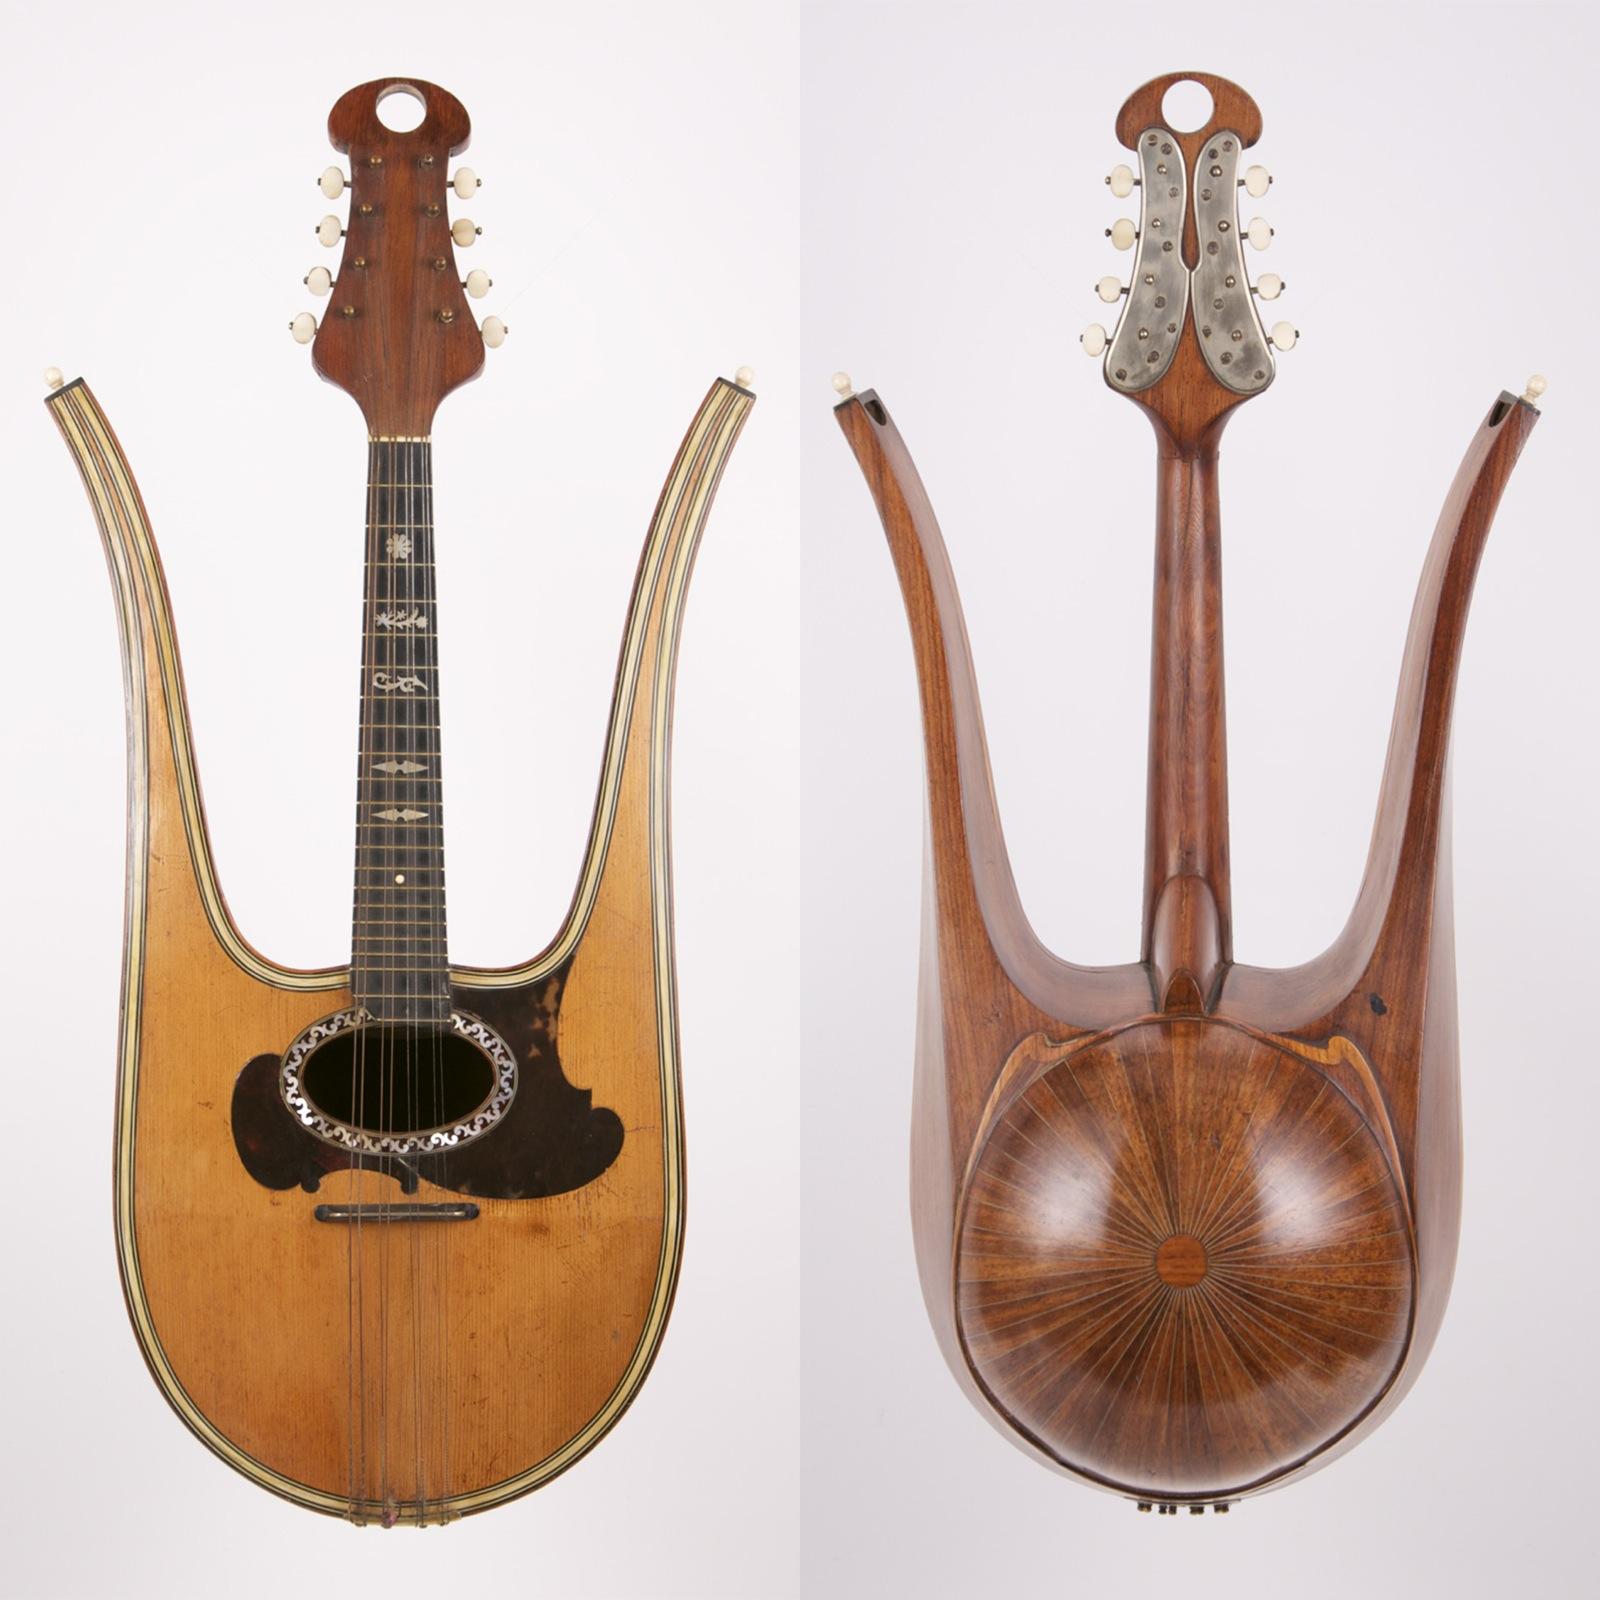 1897-mandoline-Raffaele-Calace-27